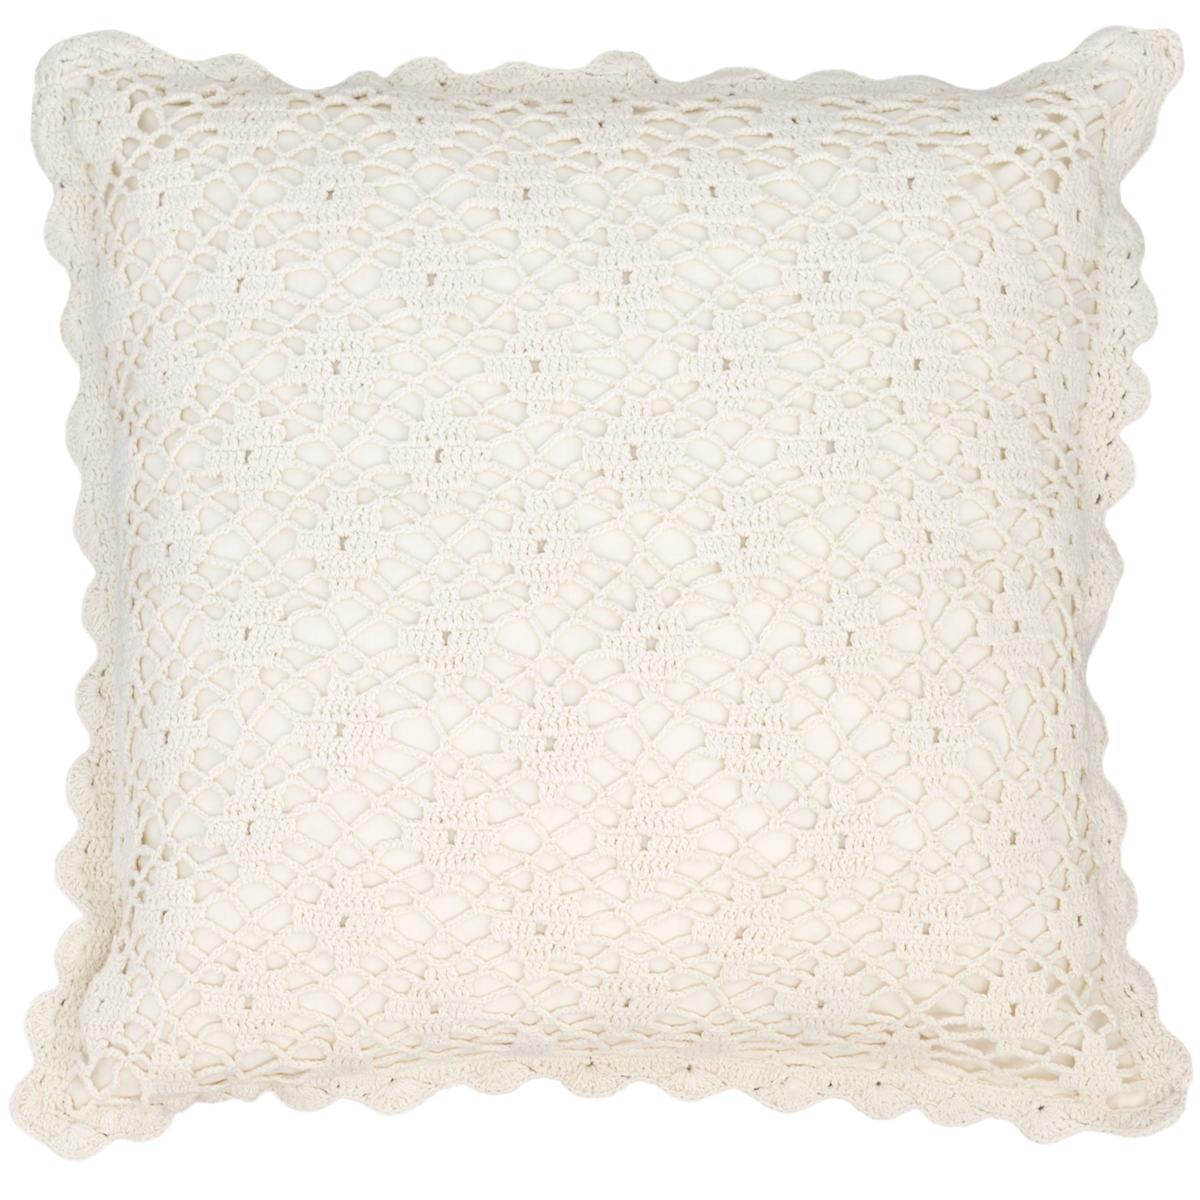 Lorient Crochet Ivory Decorative Pillow